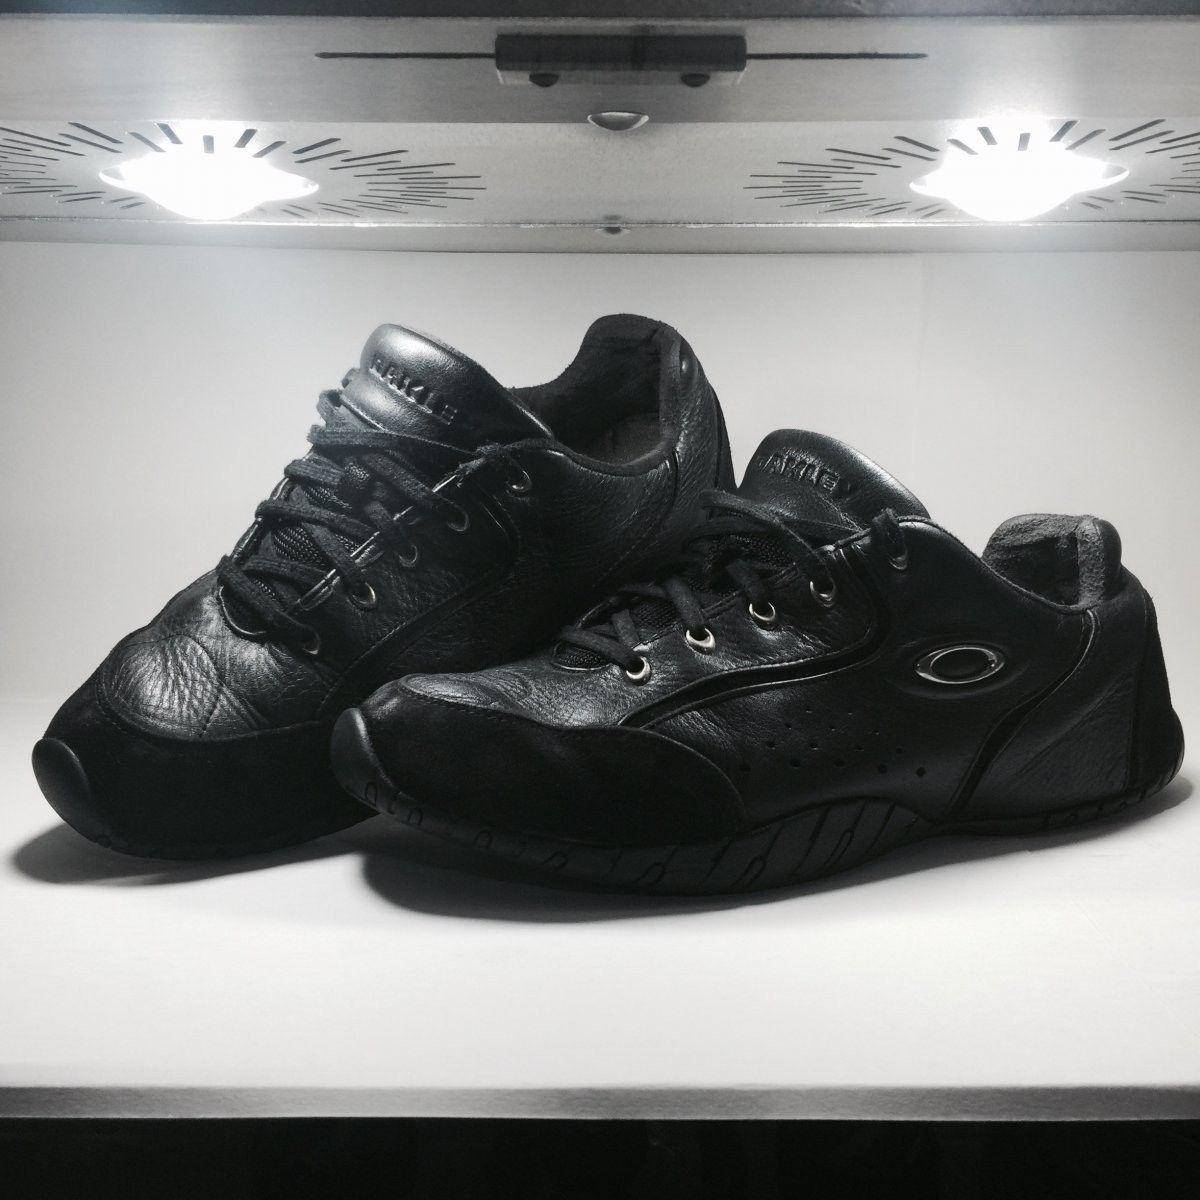 Oakley Shoes Size 12.5 Original Rip Cords Black/Chrome - Oakley Rip Cord Black Chrome (0).jpg